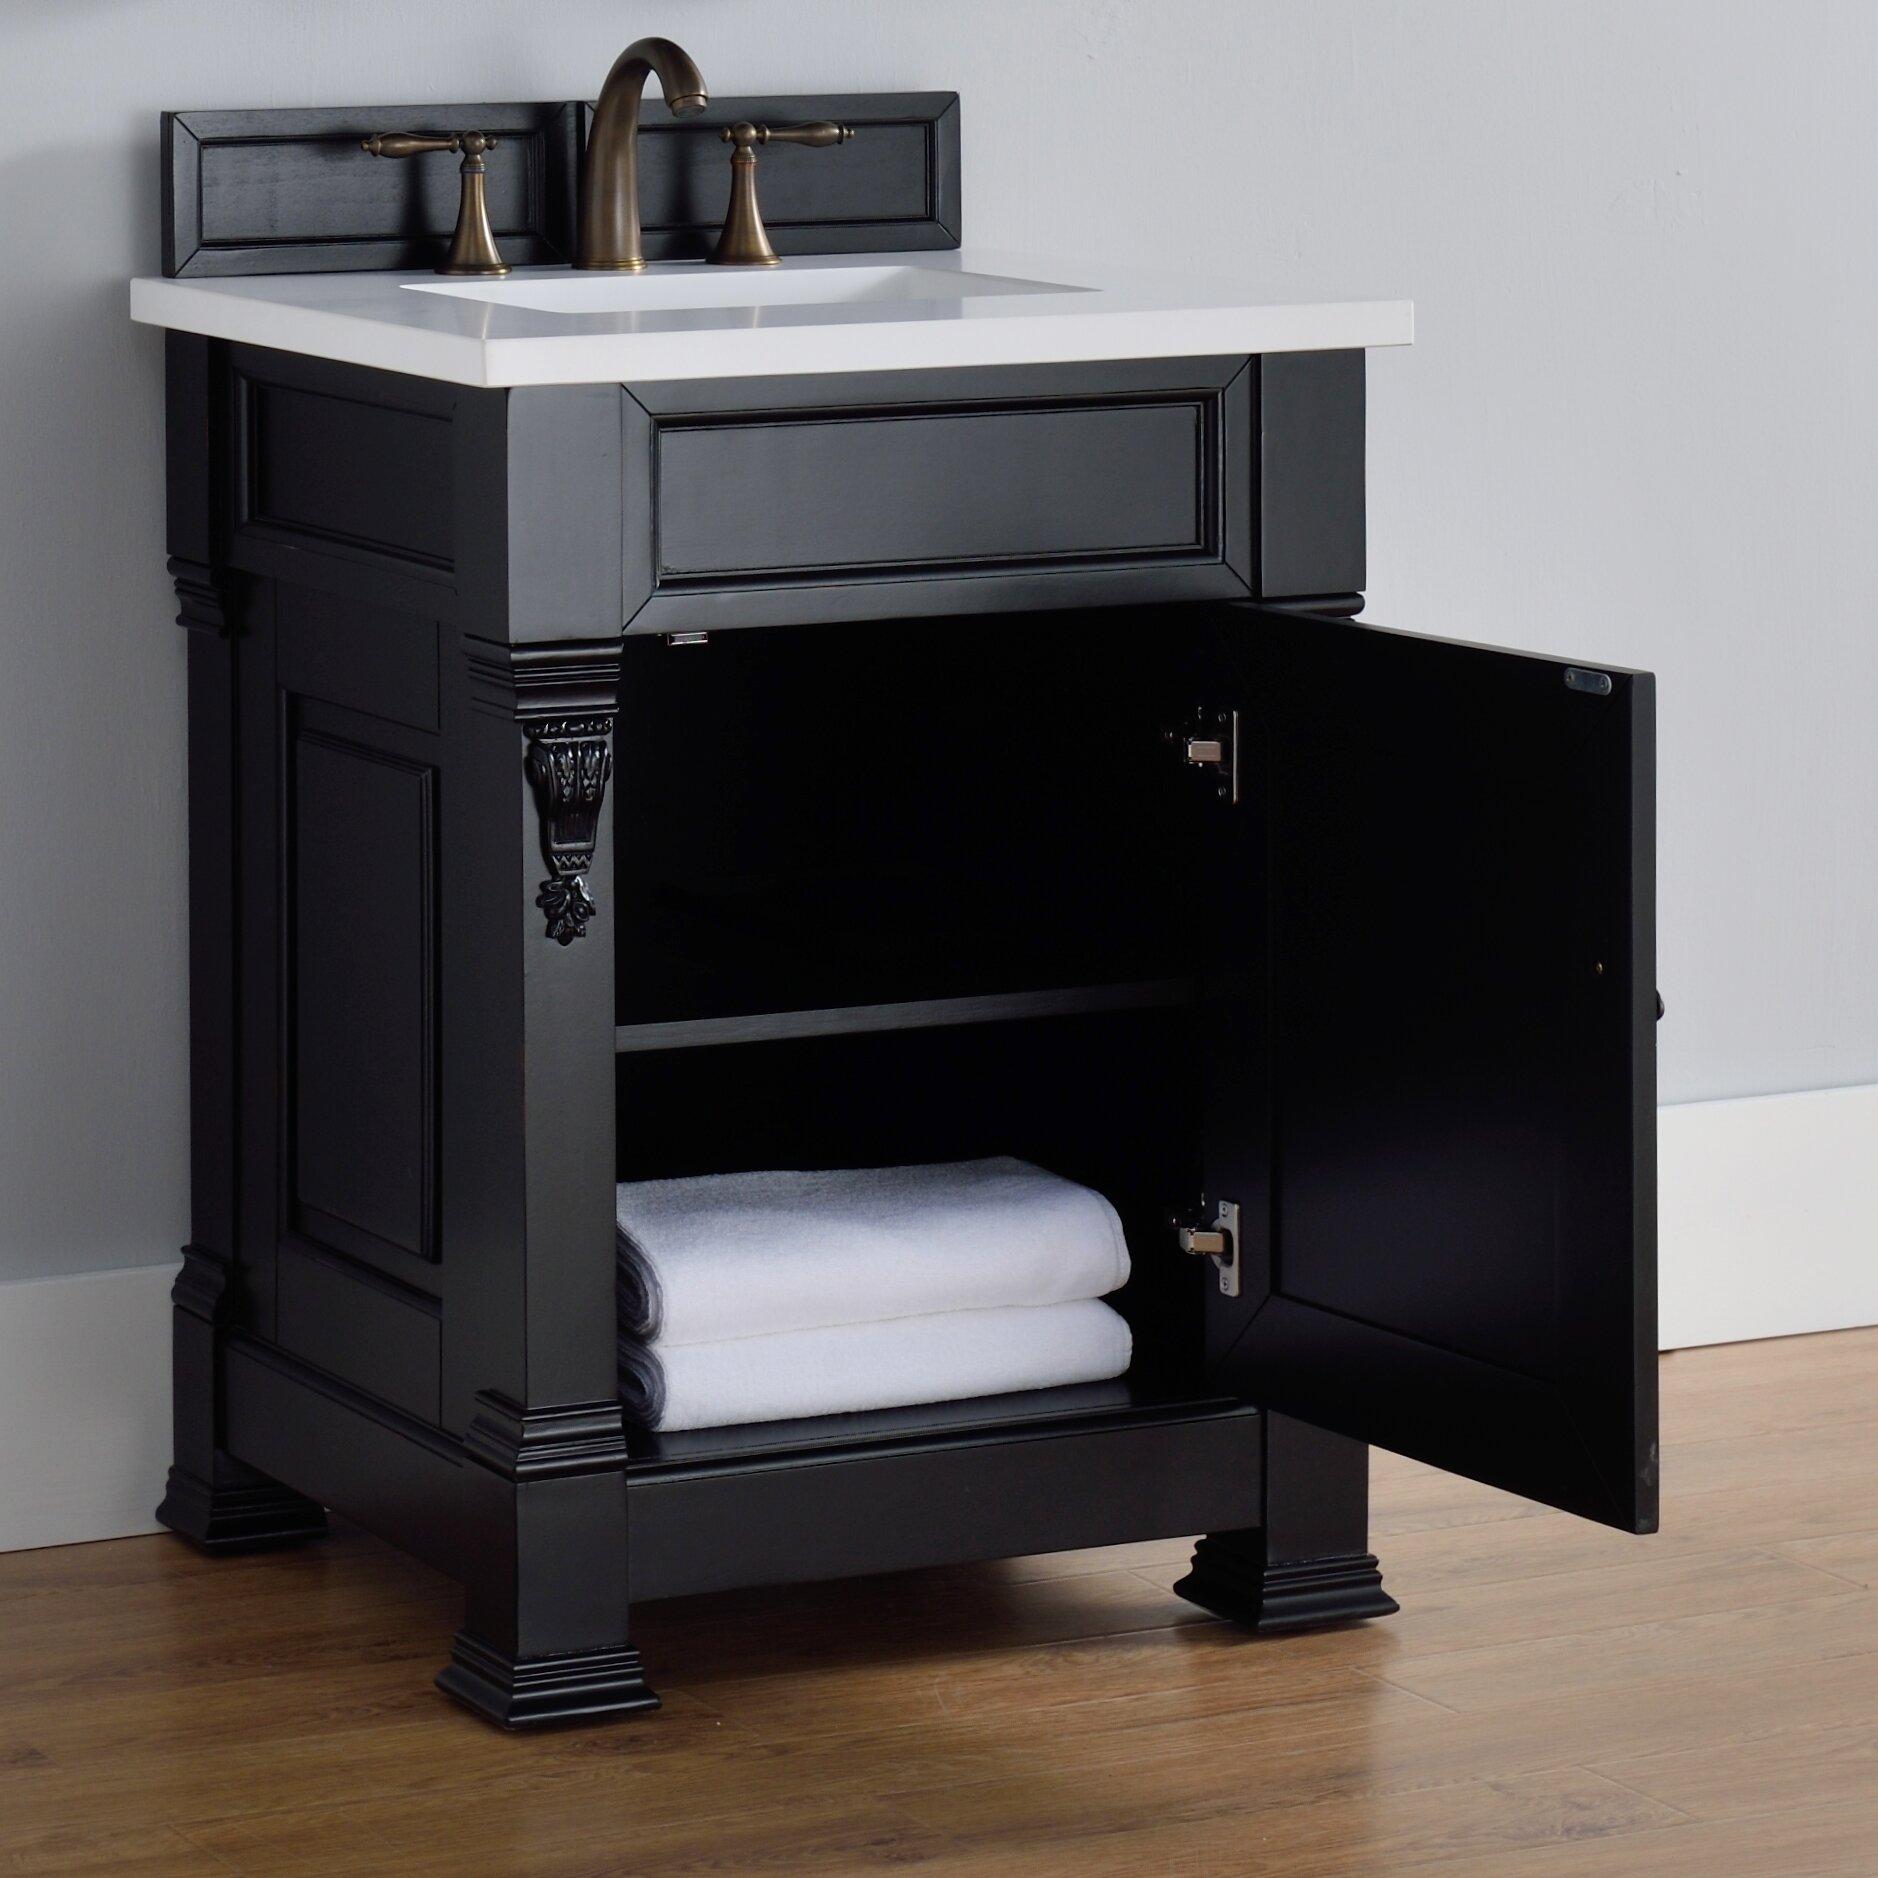 "Black Bathroom Vanity Set: James Martin Furniture Brookfield 26"" Single Antique Black"